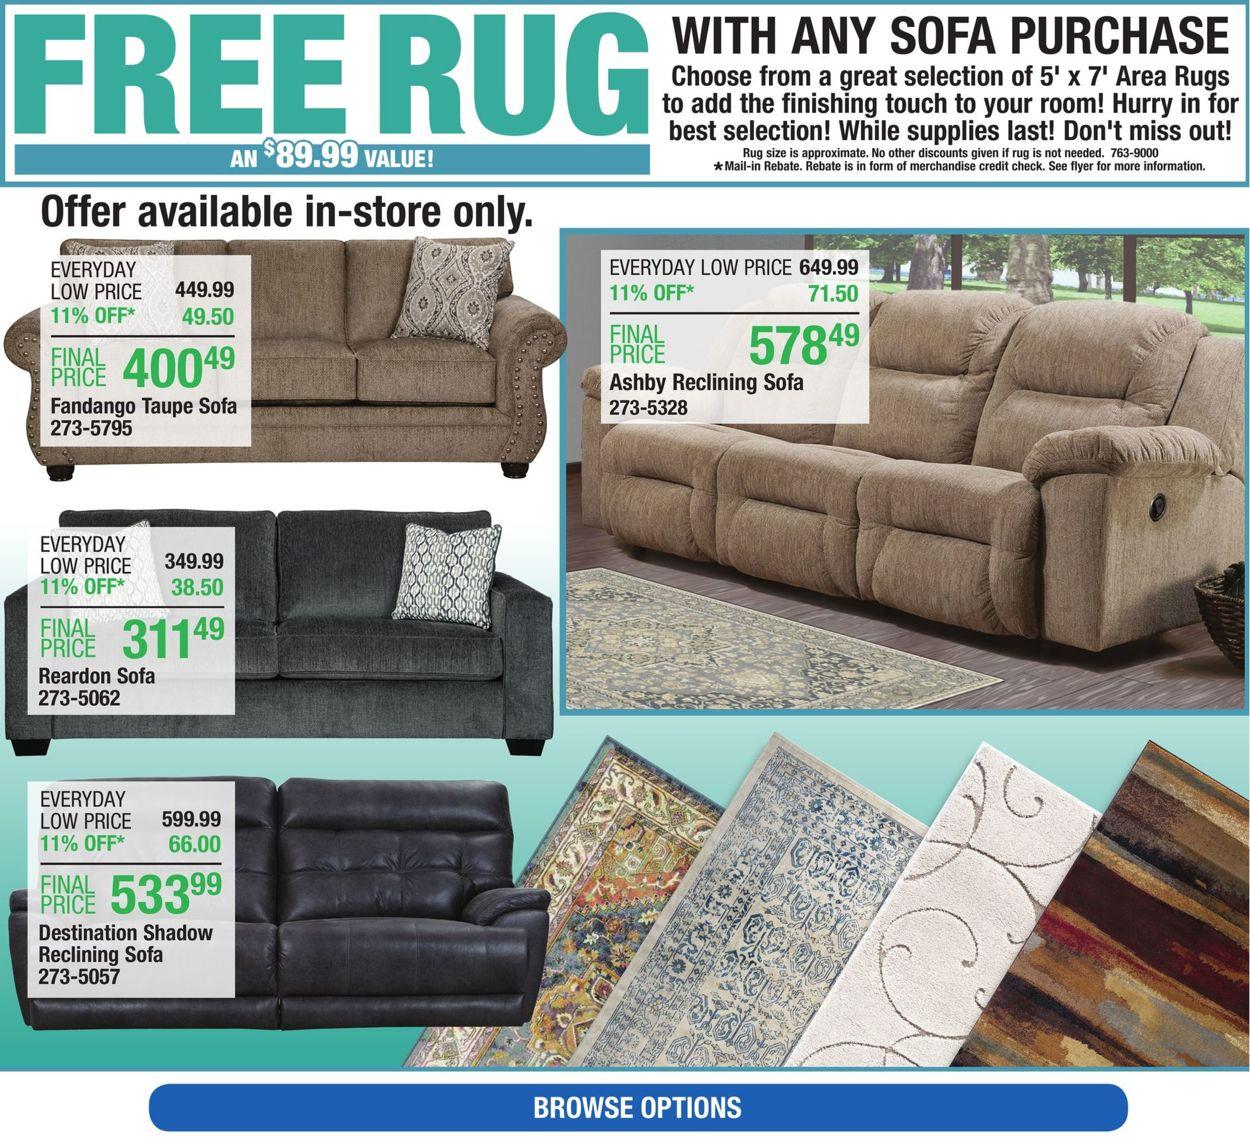 Menards Cur Weekly Ad 01 05 11, Menards Living Room Furniture